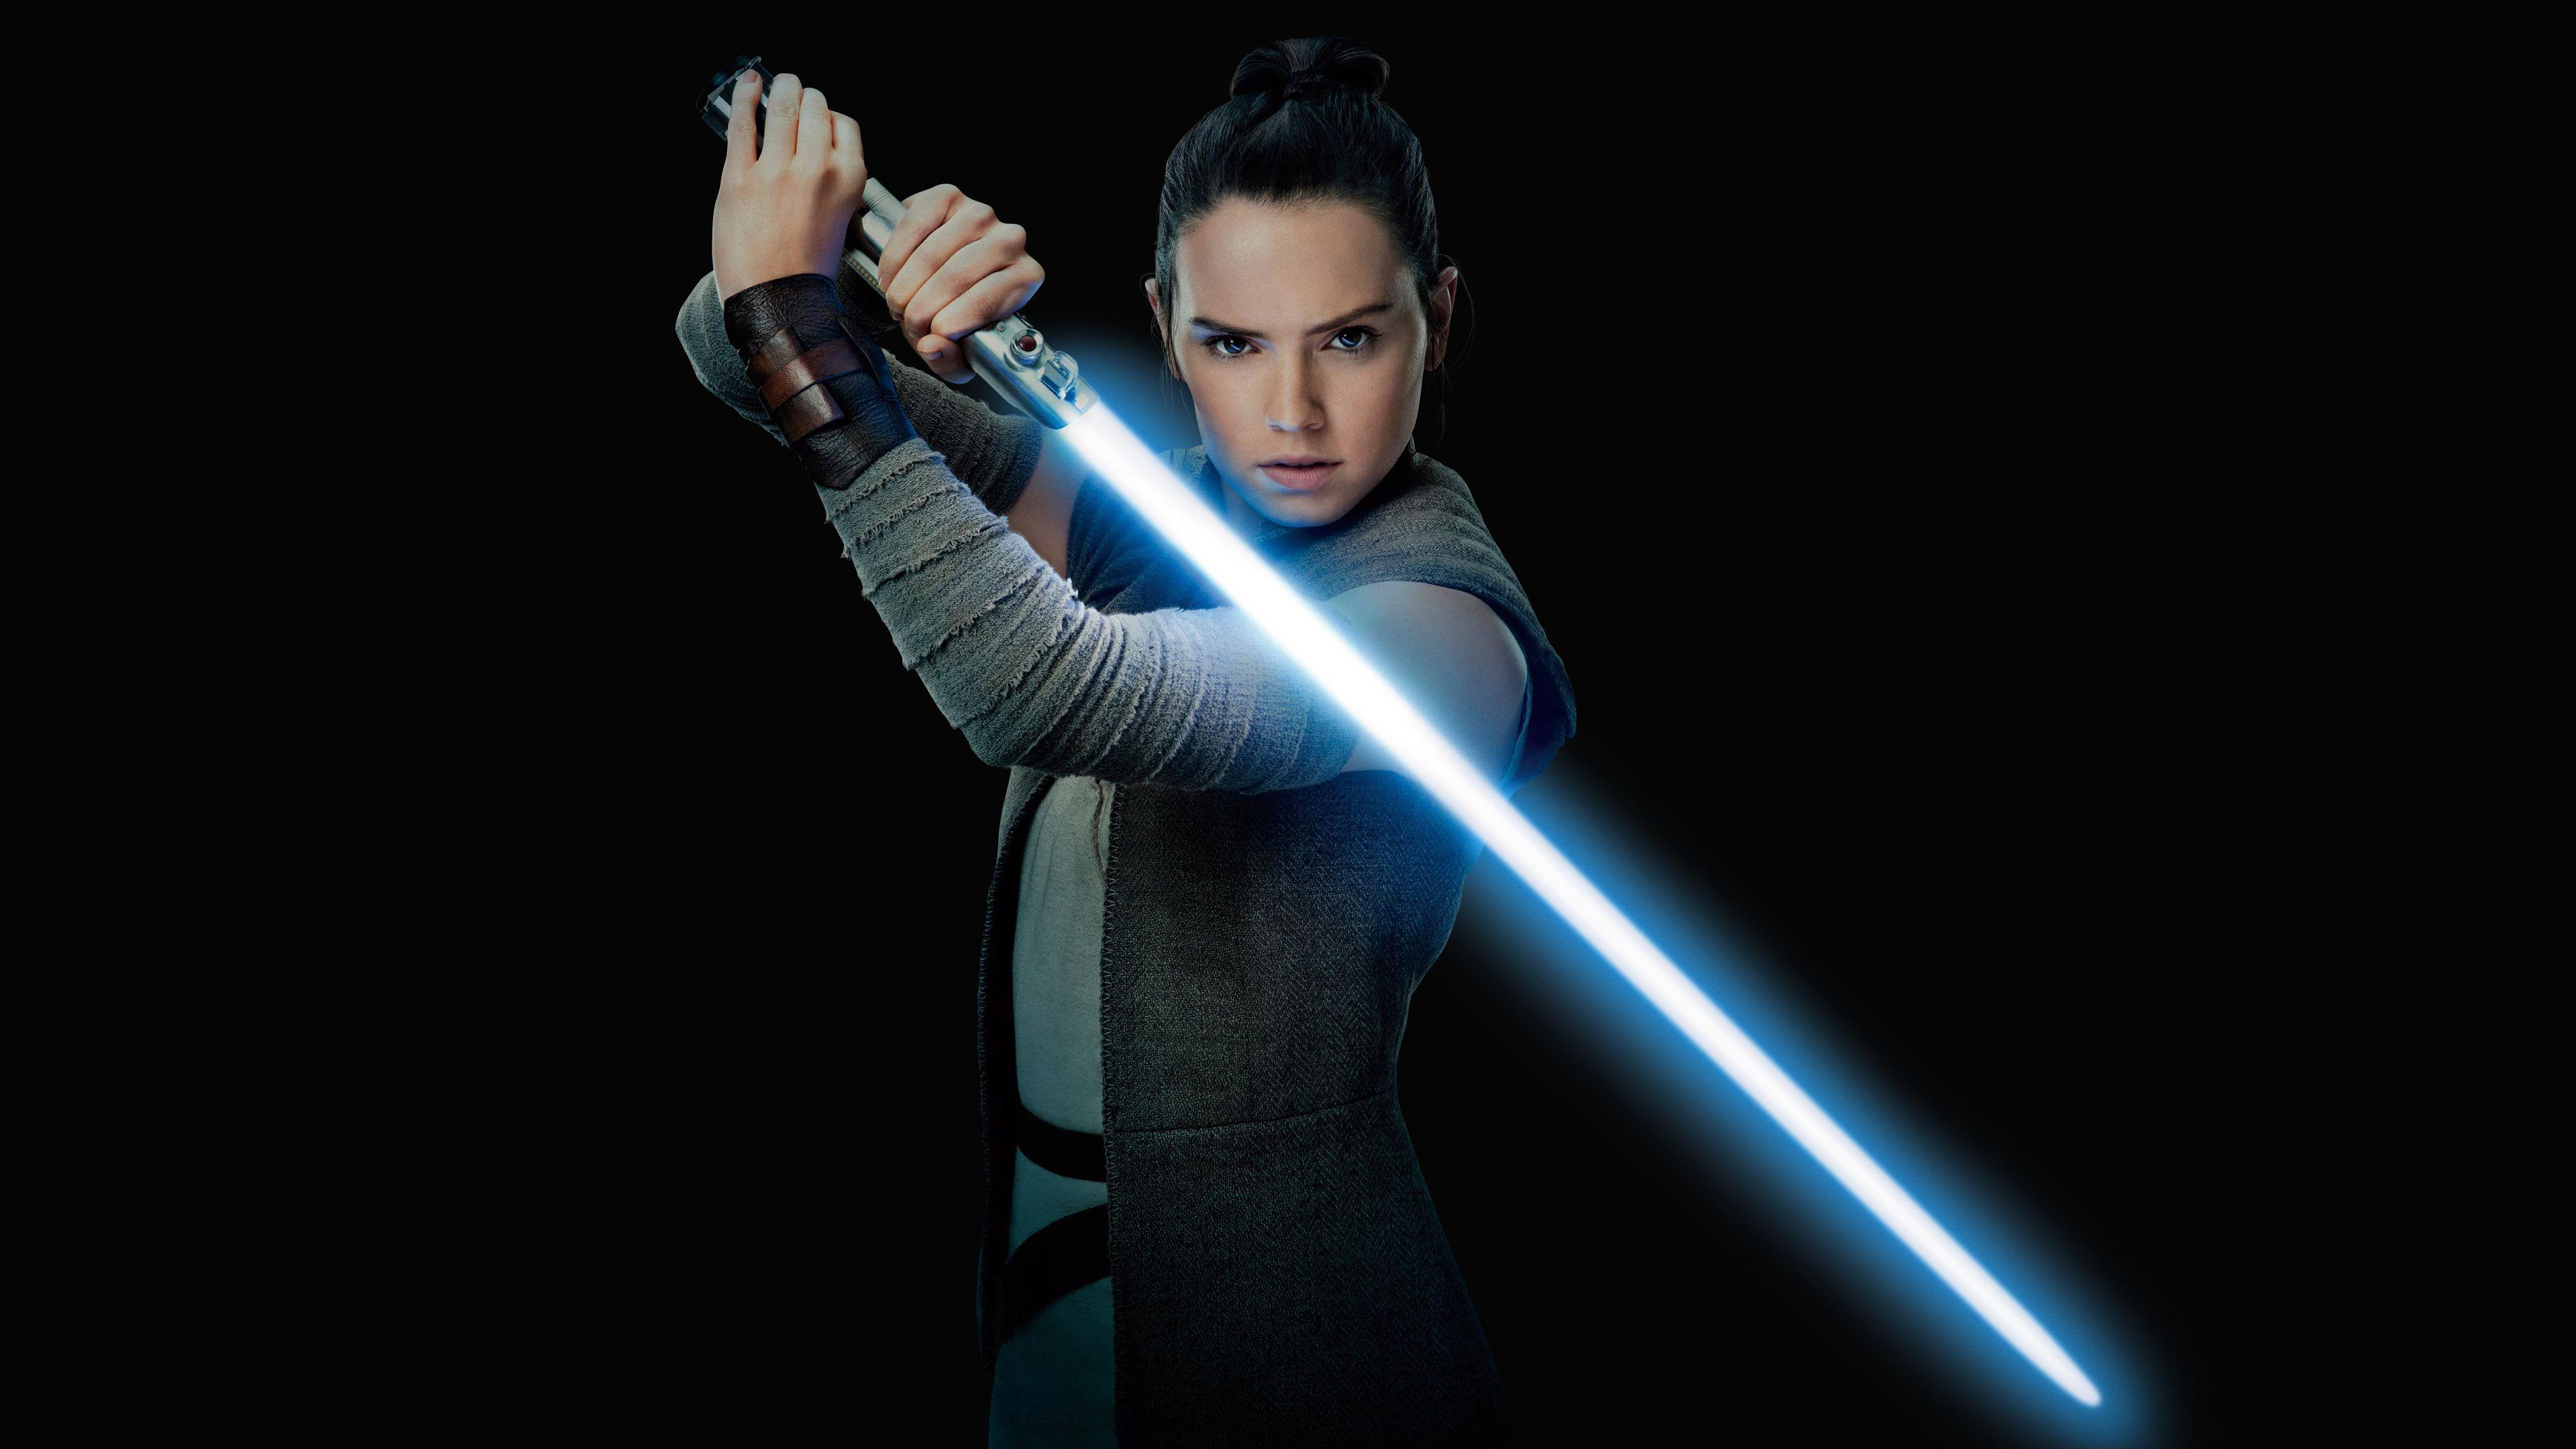 Rey Star Wars Wallpapers 1080p Rey Star Wars Star Wars Wallpaper Daisy Ridley Star Wars